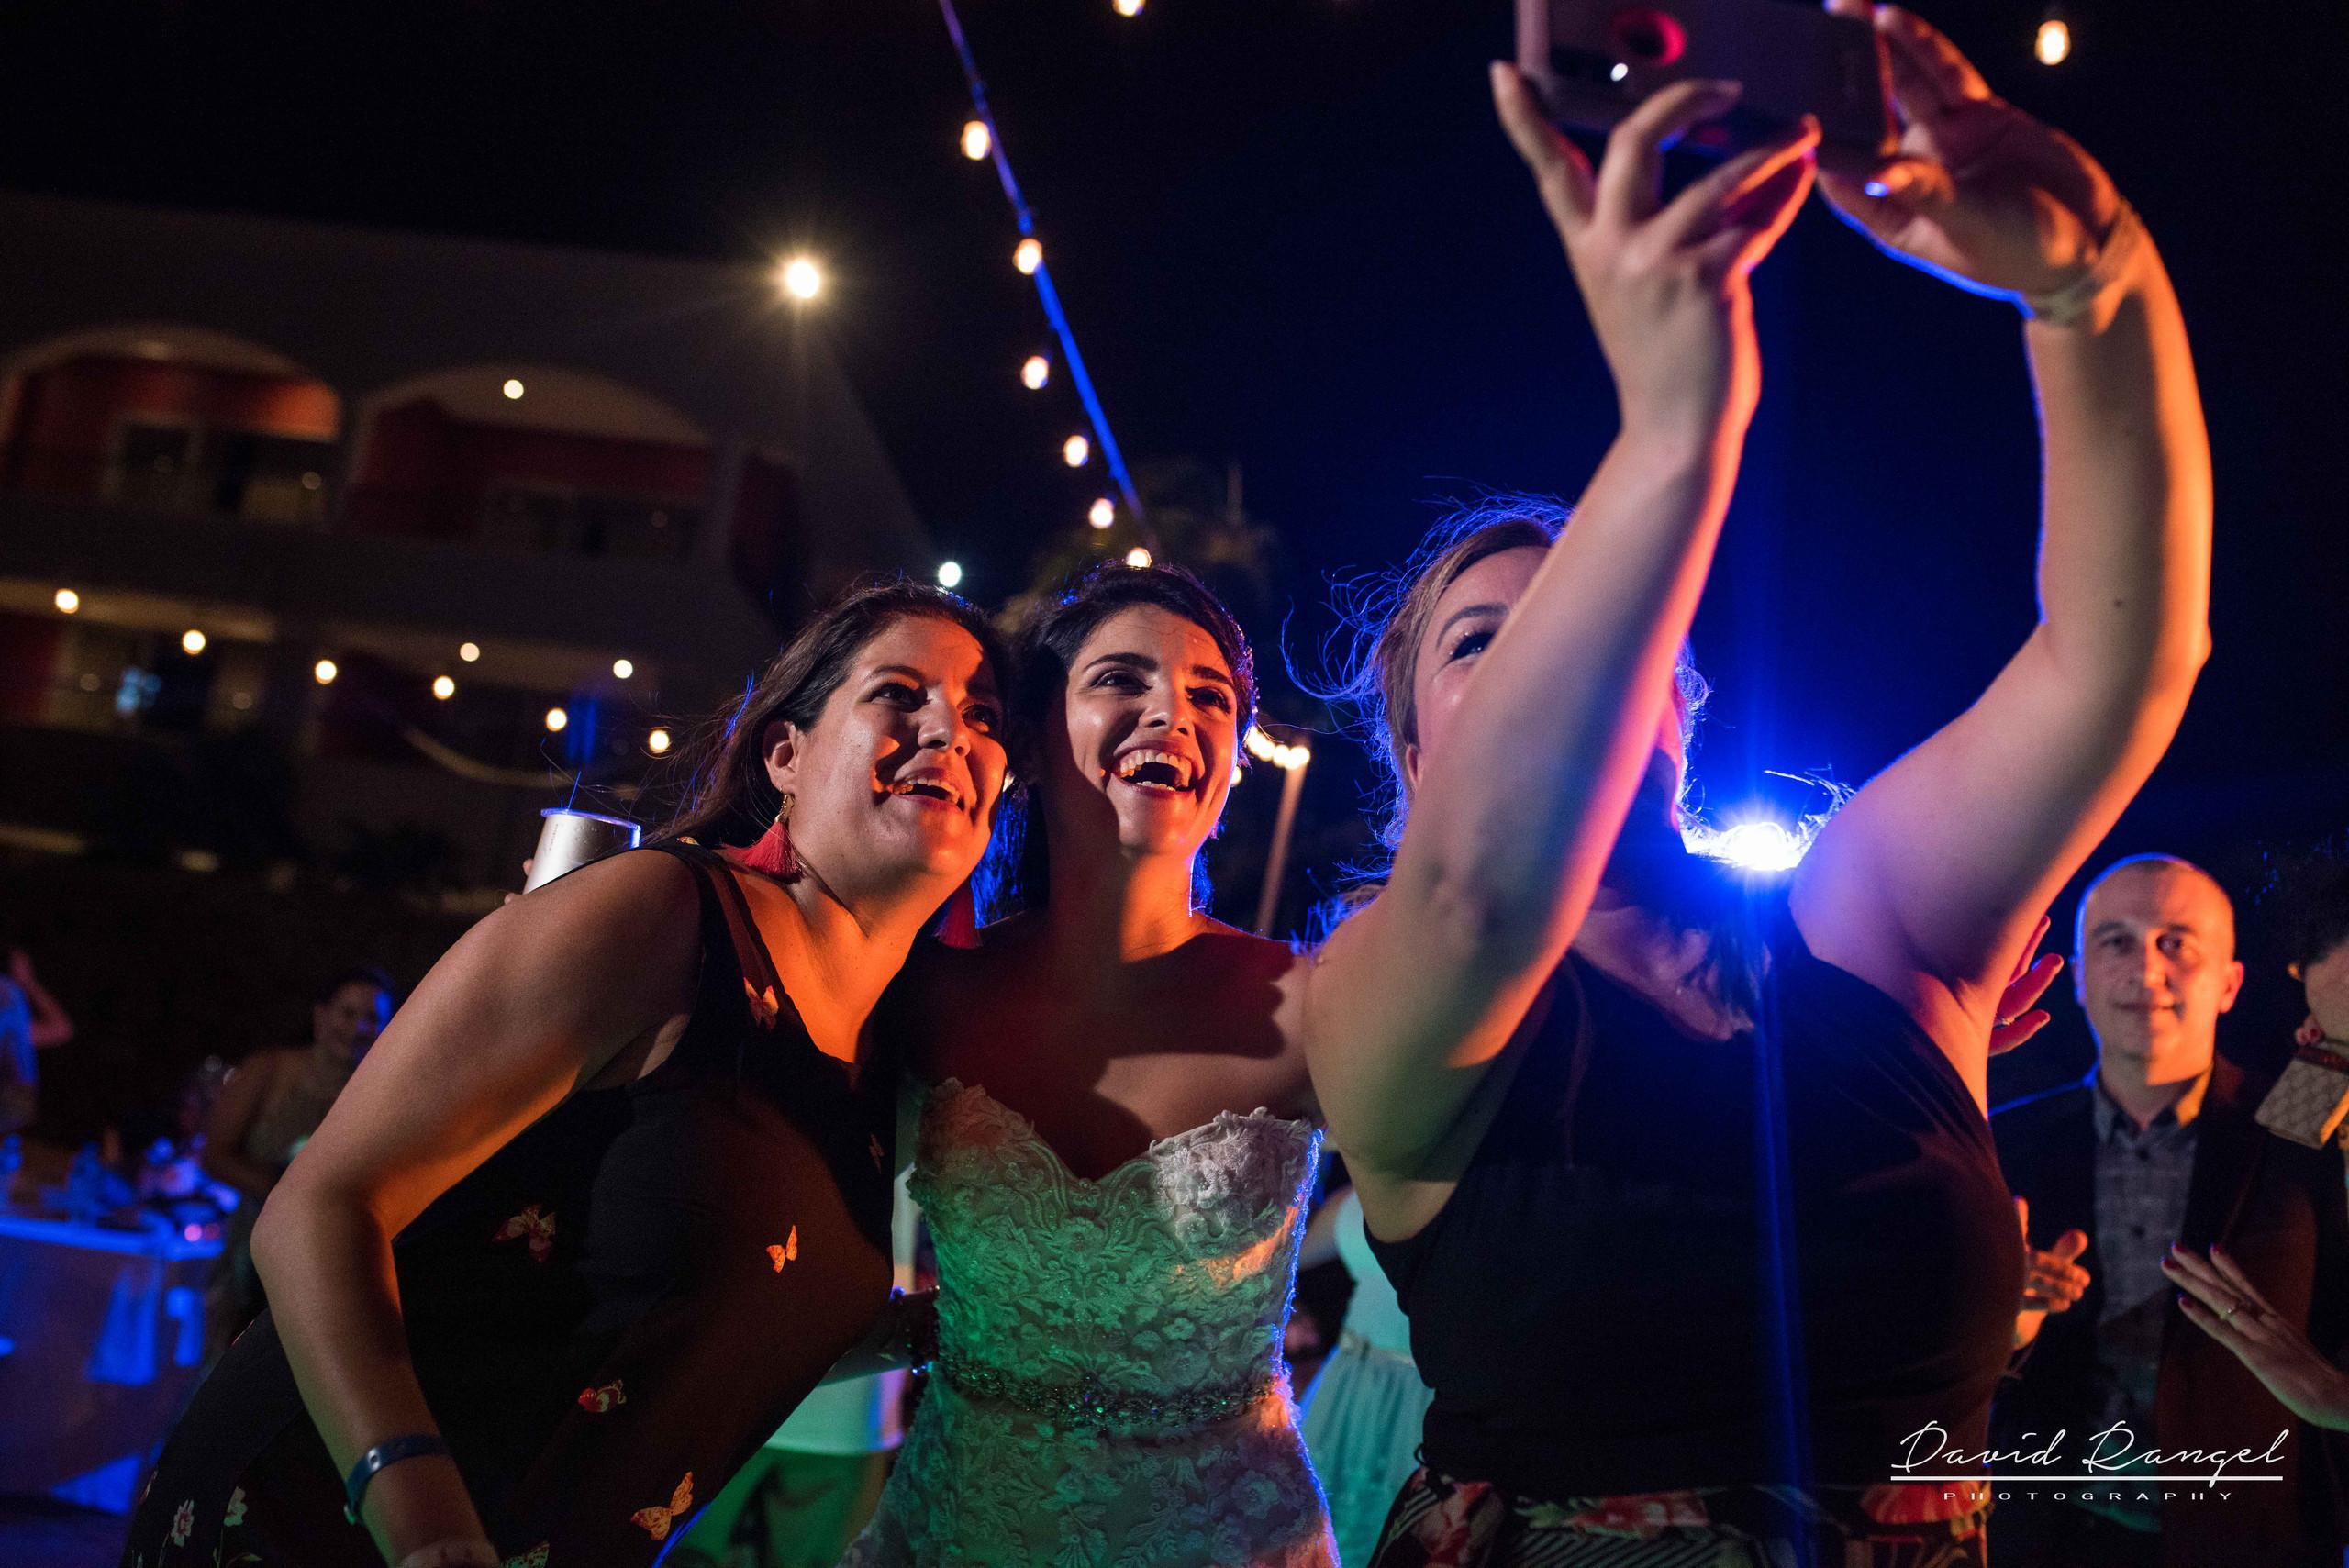 party+dance+wedding+reception+photo+bride+friends